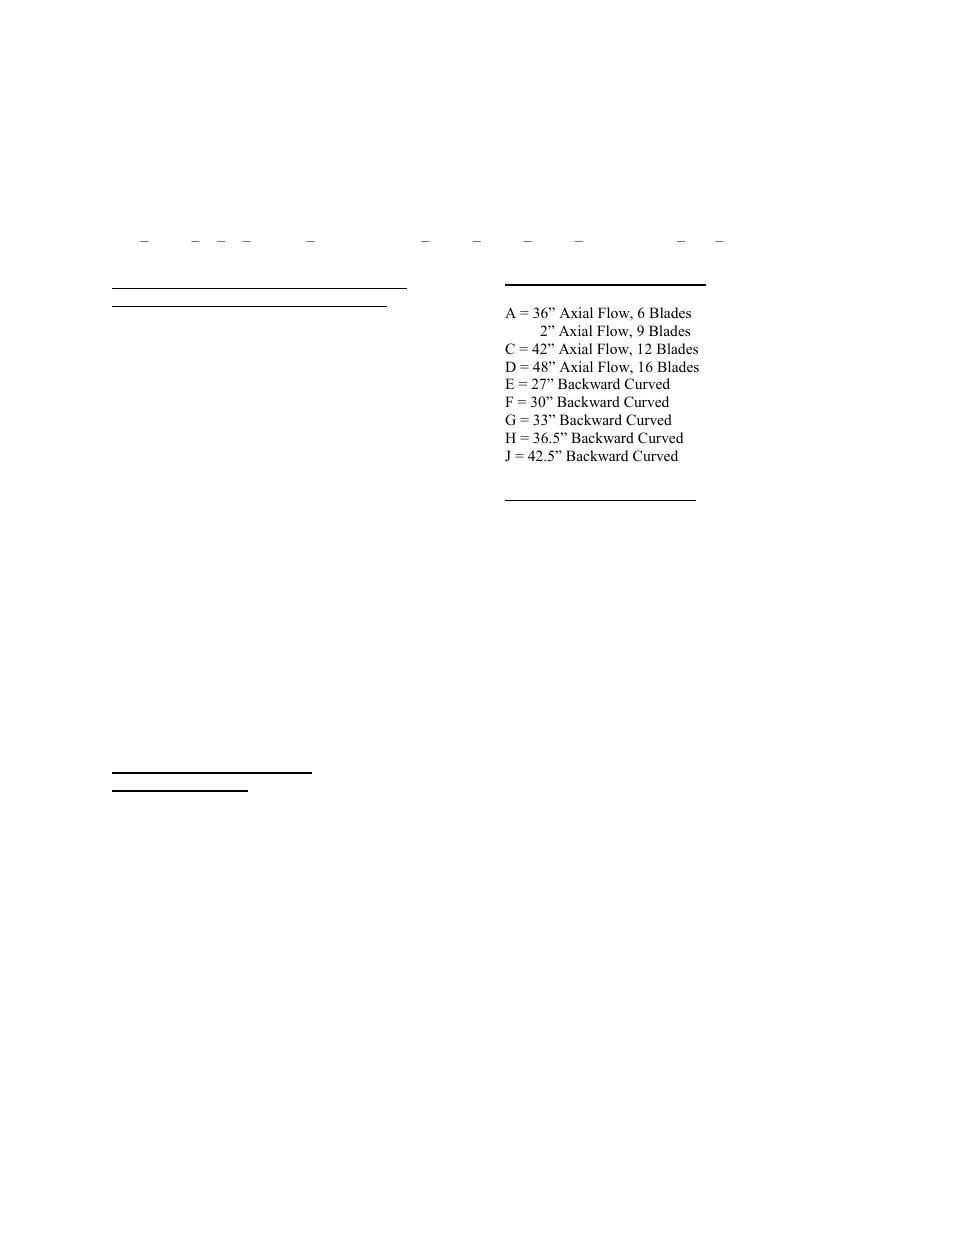 Rl series feature string nomenclature, Feature 1: return